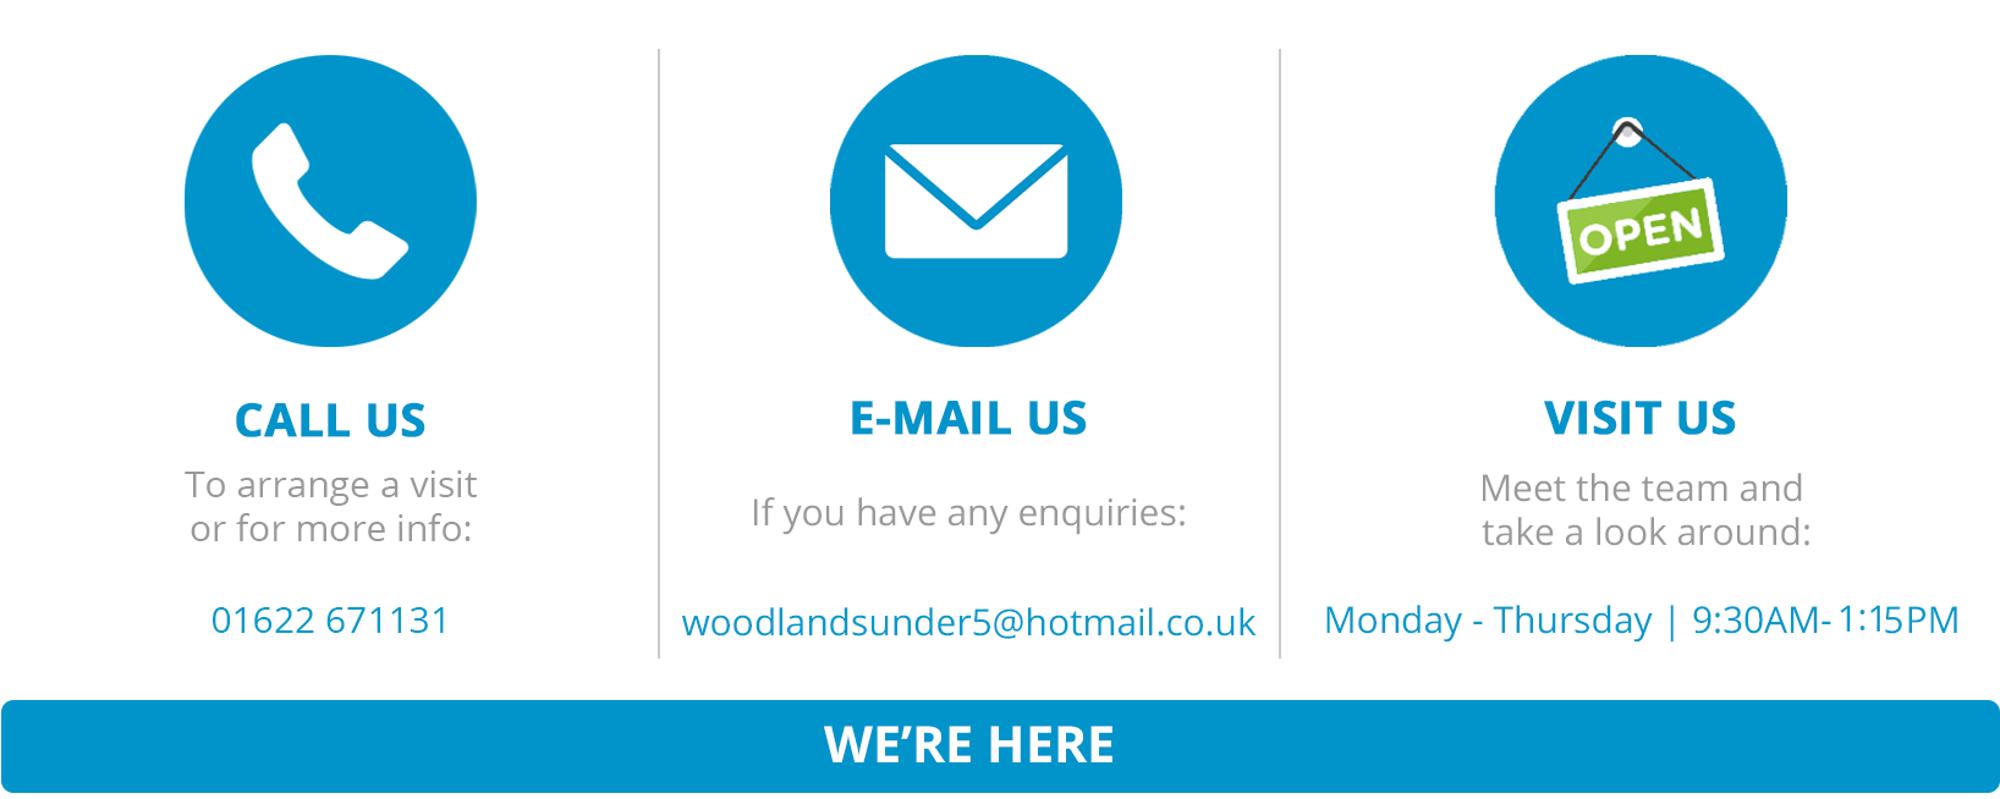 Woodlands Contact Us